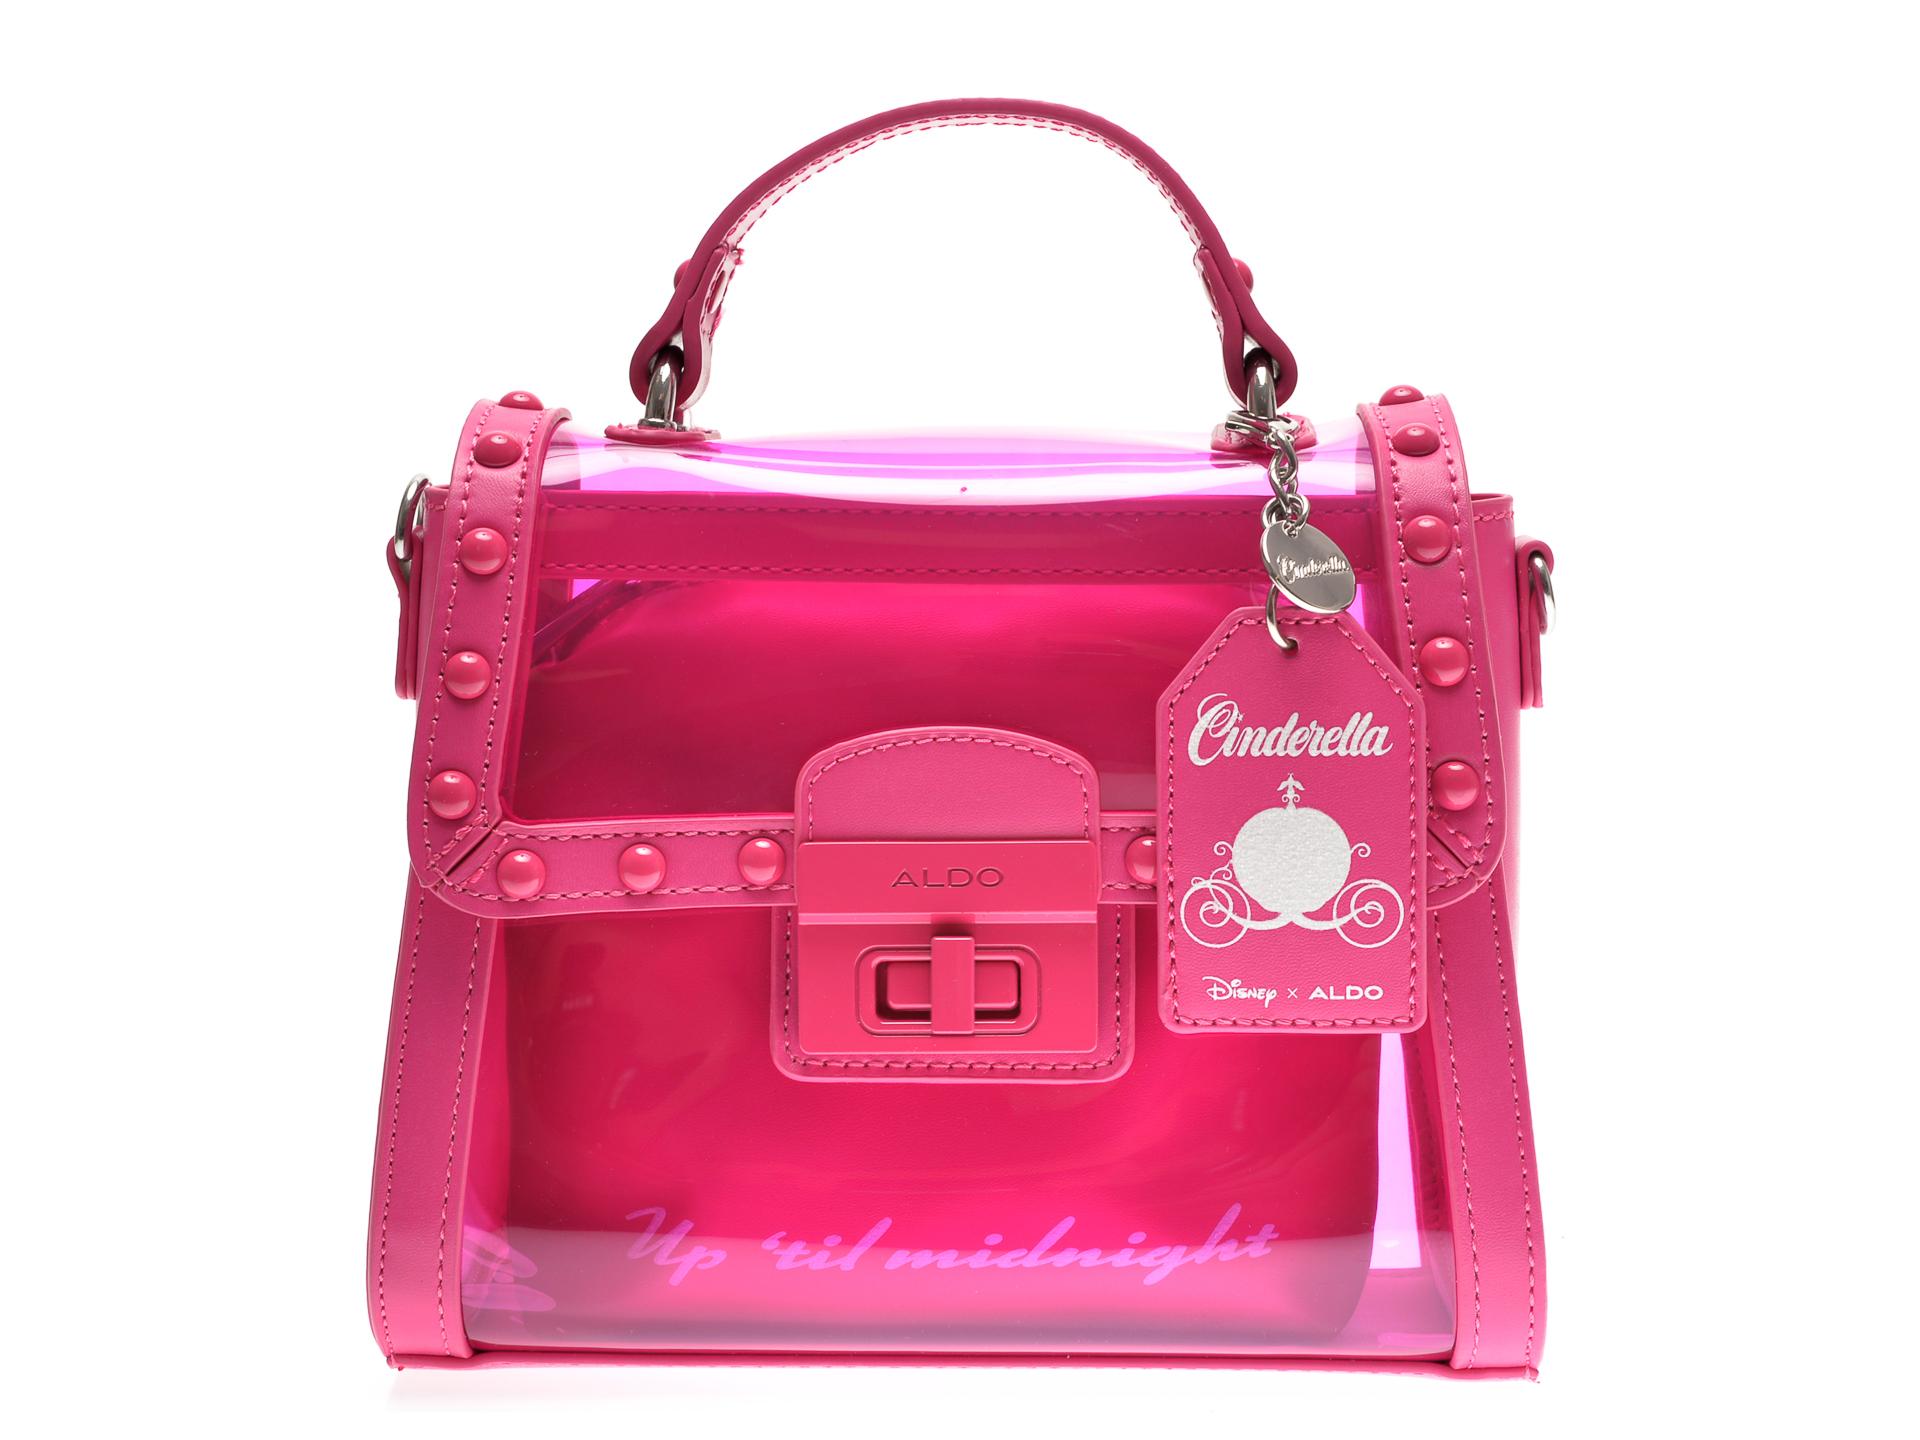 Poseta ALDO roz, Bobbidi-Boo670, din pvc imagine